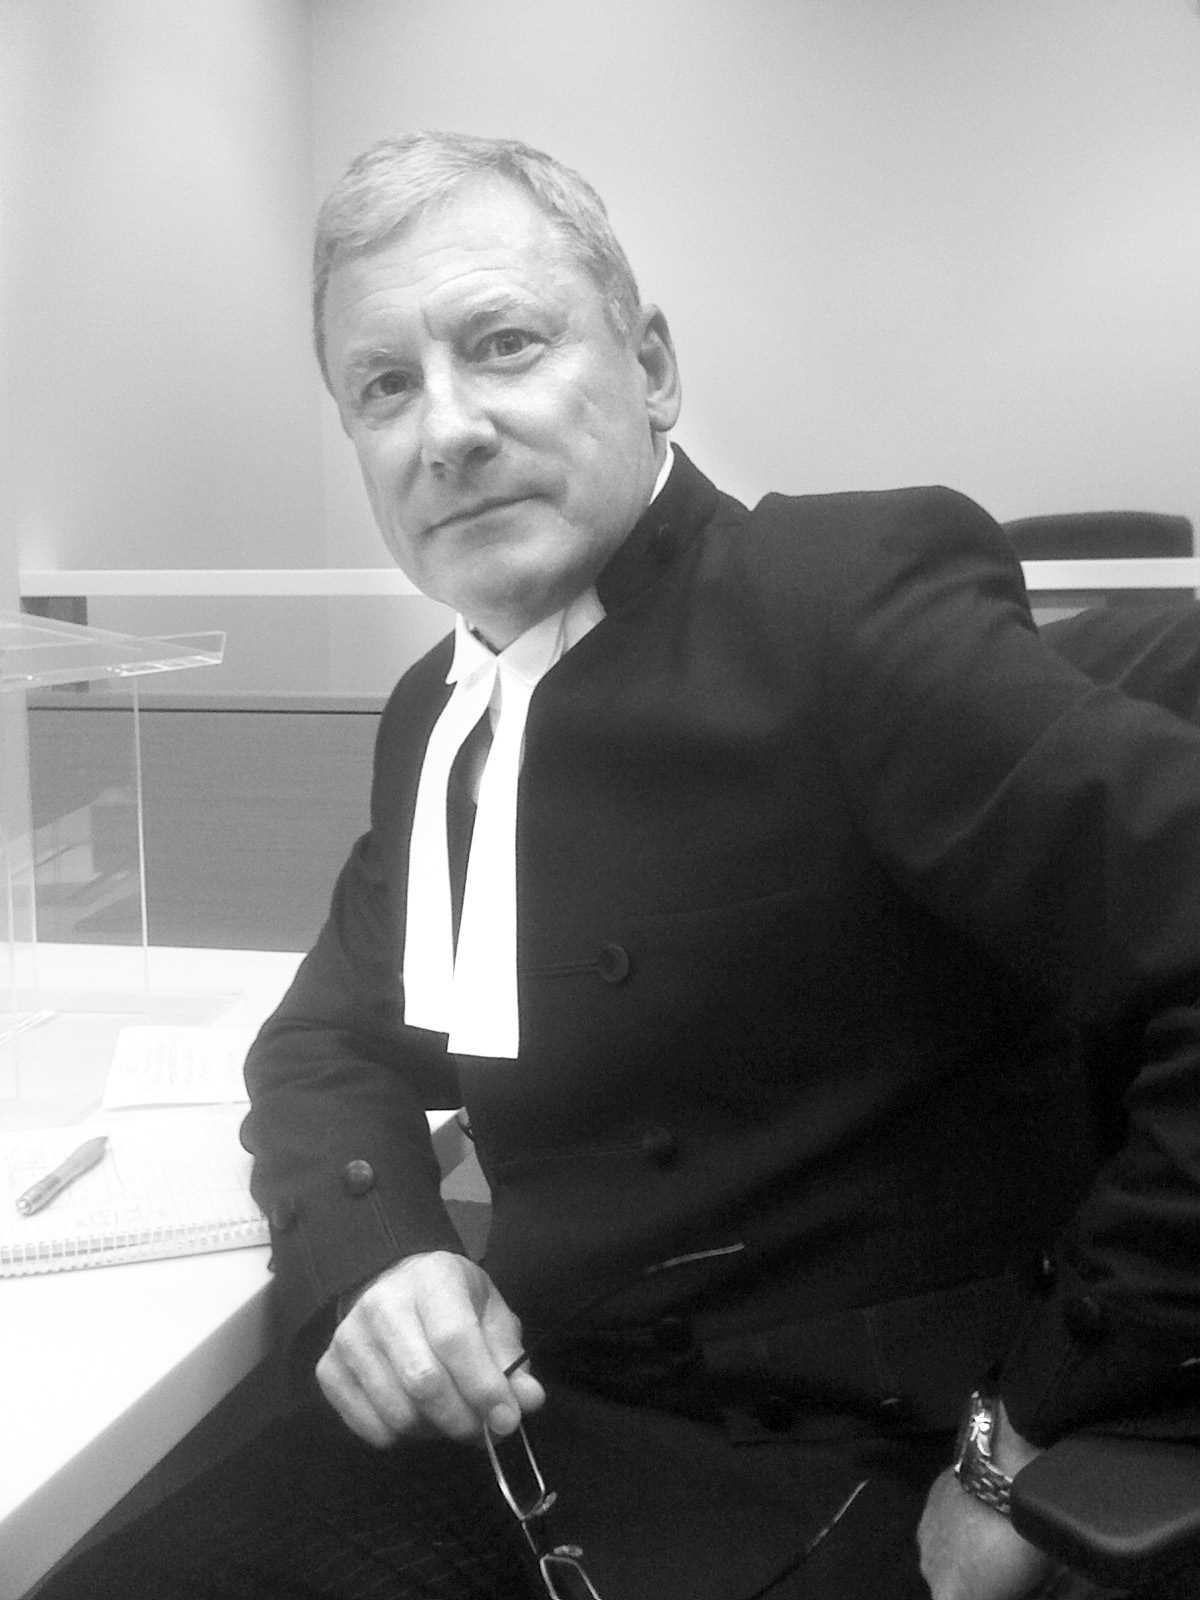 Mark Trowell, QC